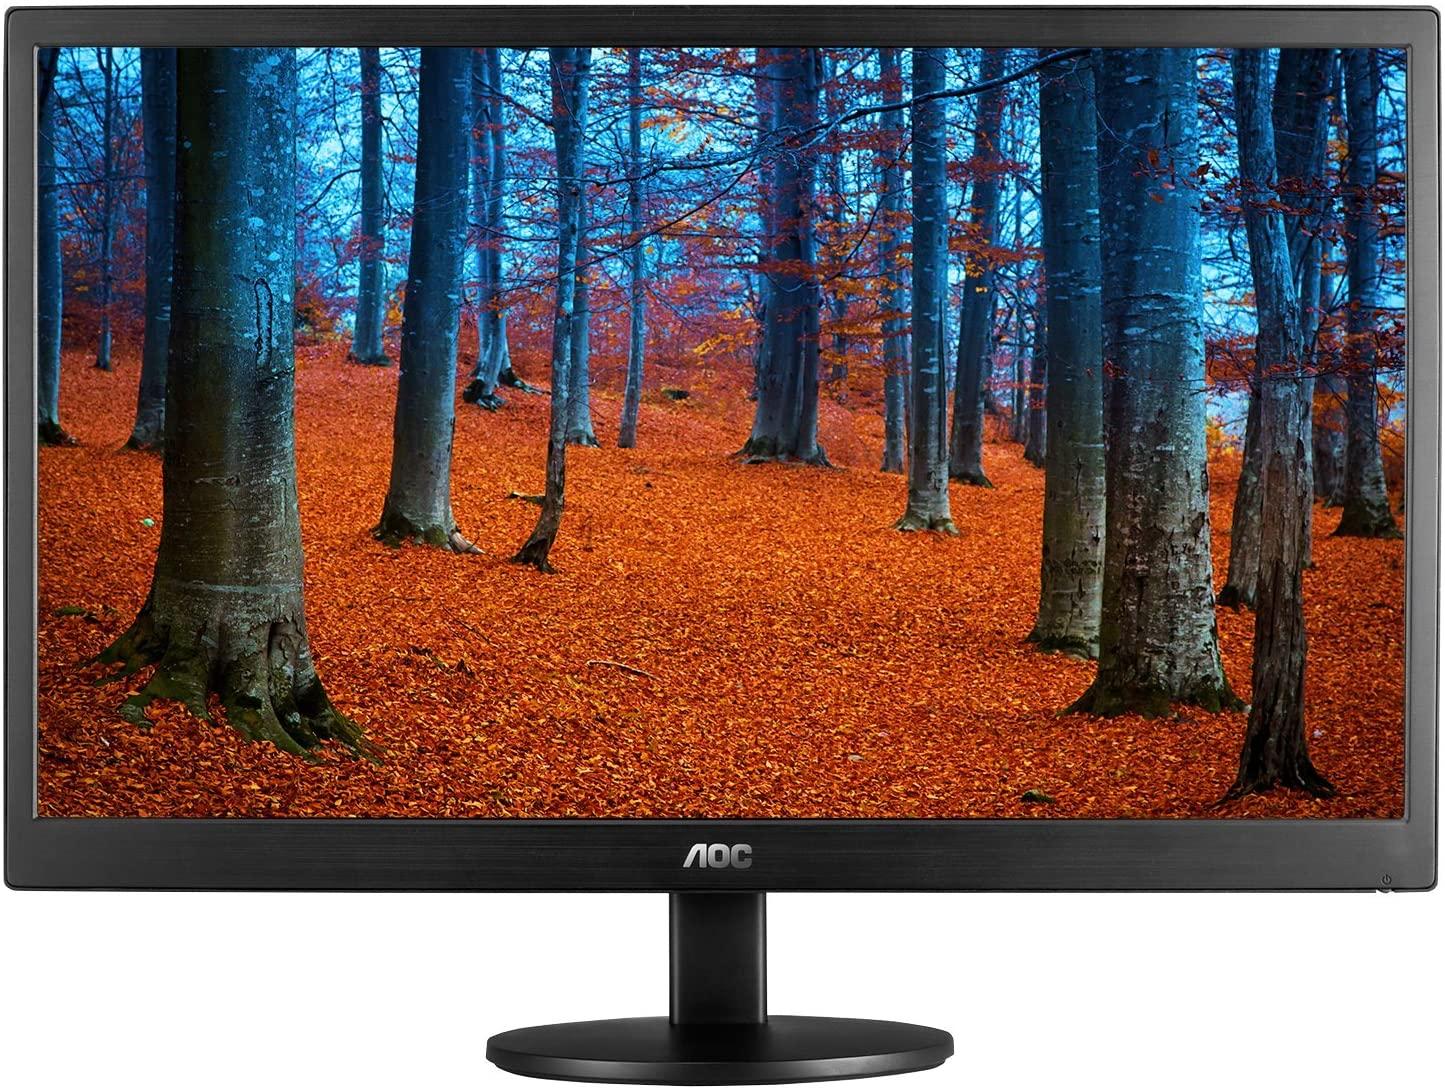 AOC e970swn 18.5-Inch LED-Lit Monitor, 1366 x768 Resolution, 5ms, 20M:1 DCR, VGA, VESA